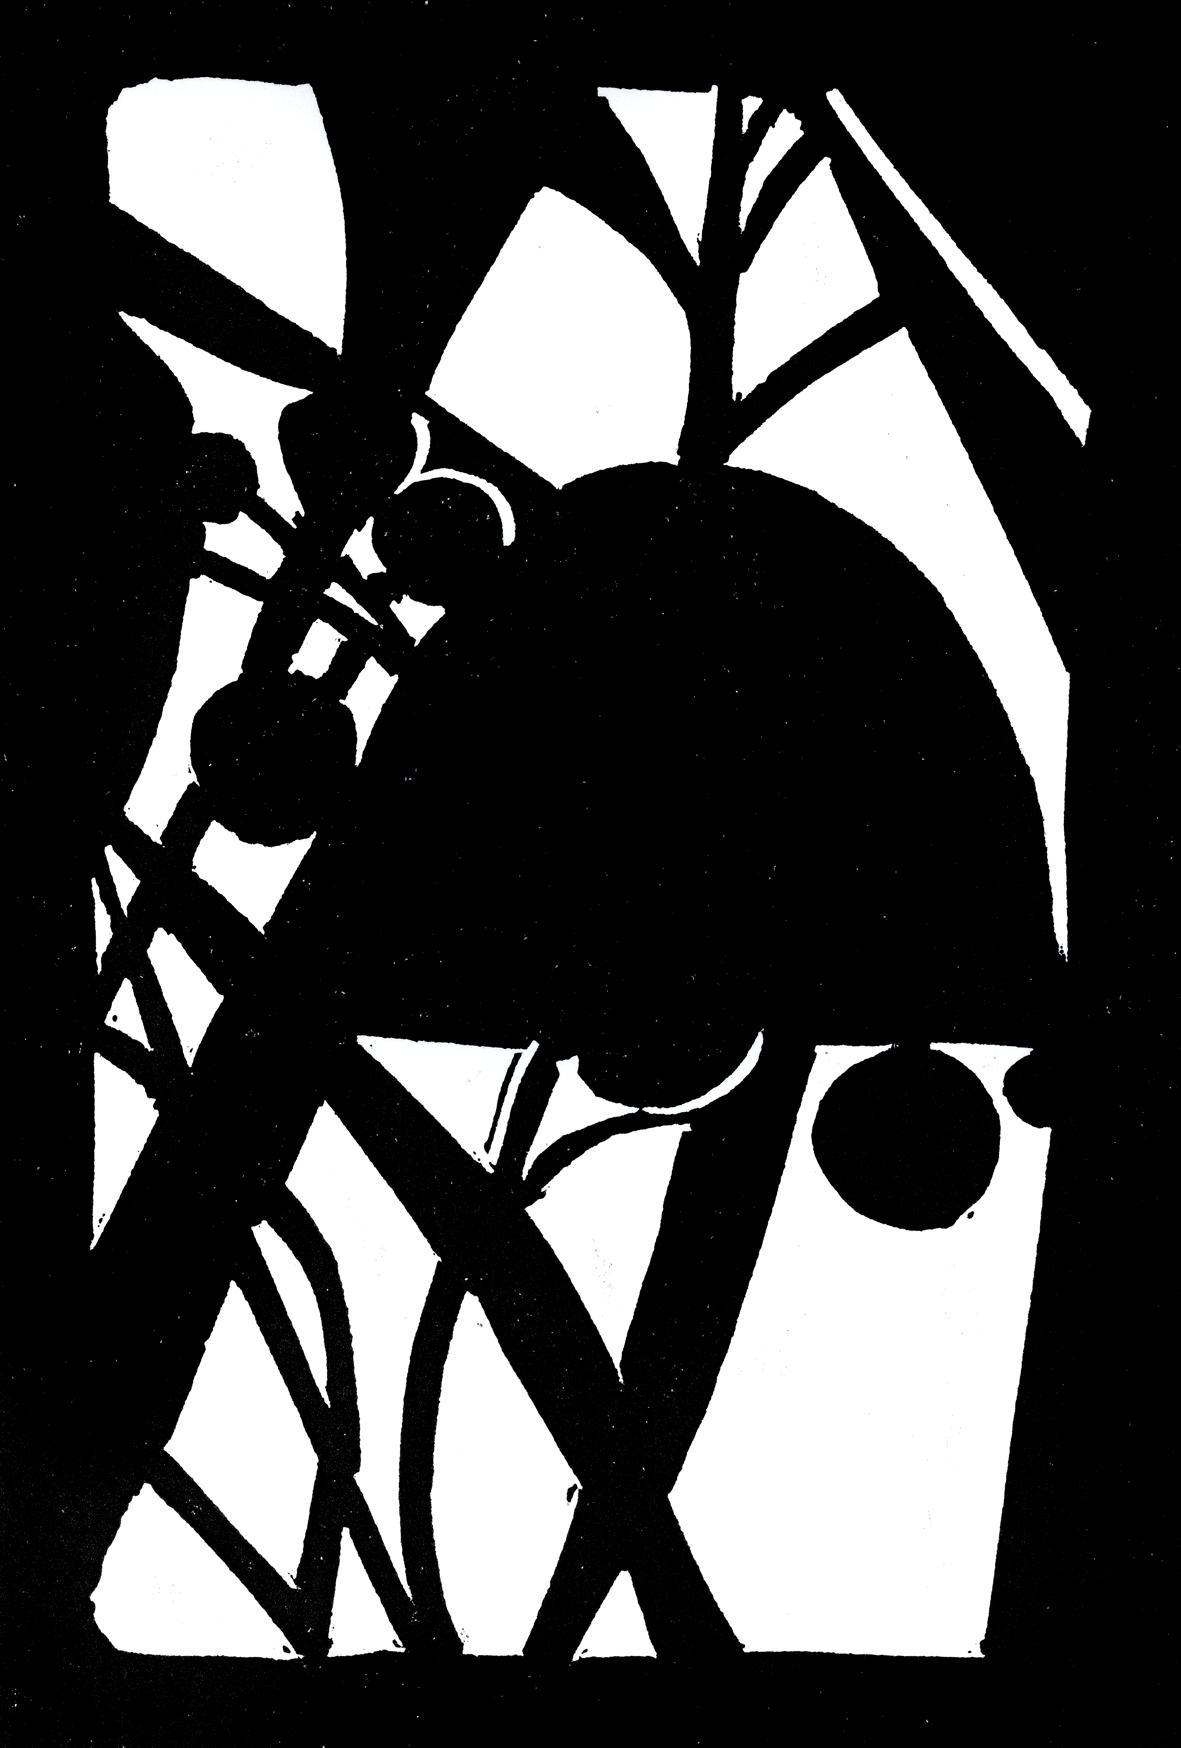 Mem for Wisdom  Flower: Wattle  (Acacia rostellifera)